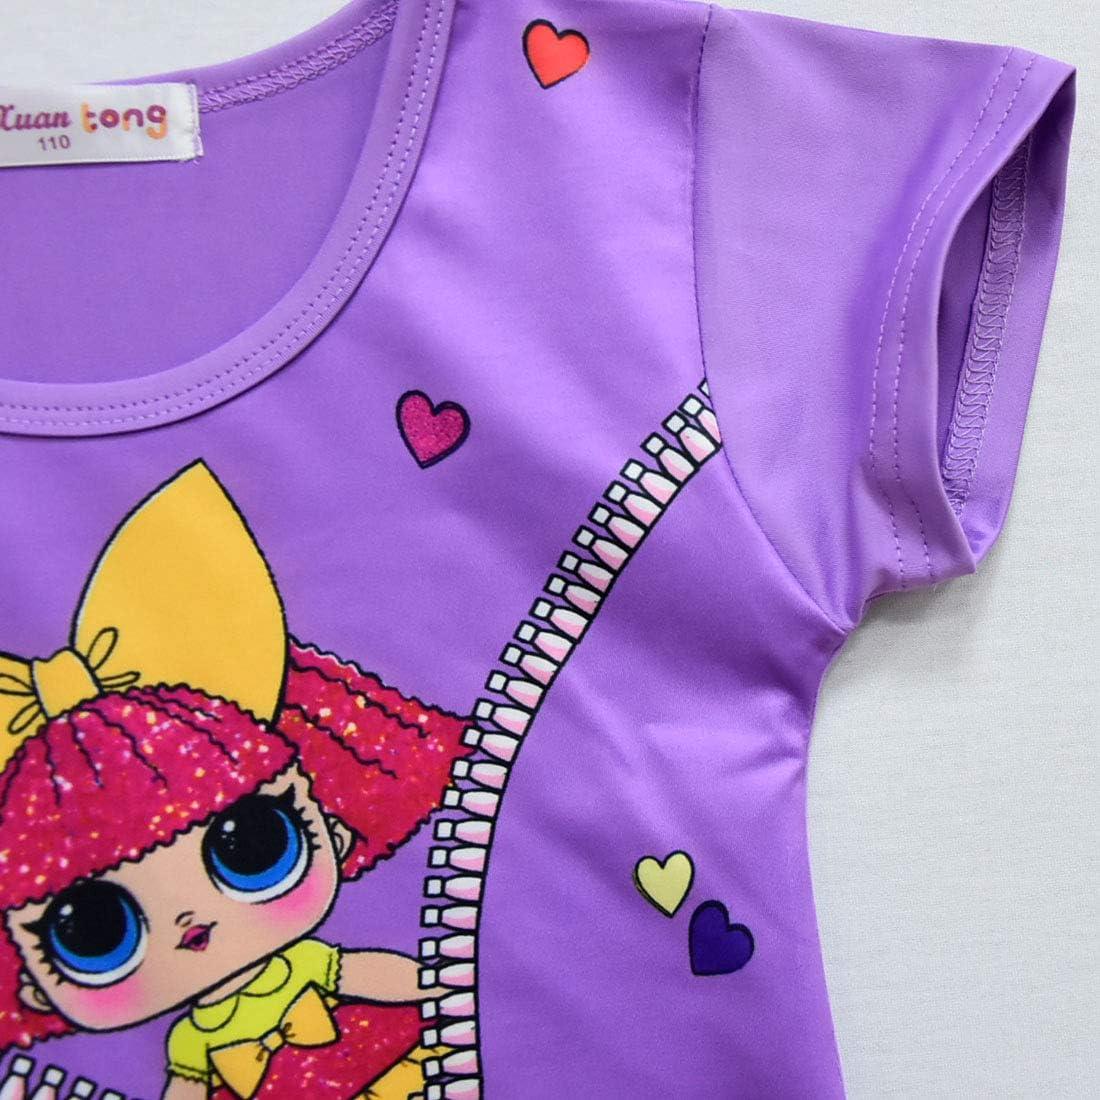 BT Willing Purple Nightie Or Shortie Dolls Confetti Pop Nightie Dresses for Girls Lil Outrageous Littles Pyjama